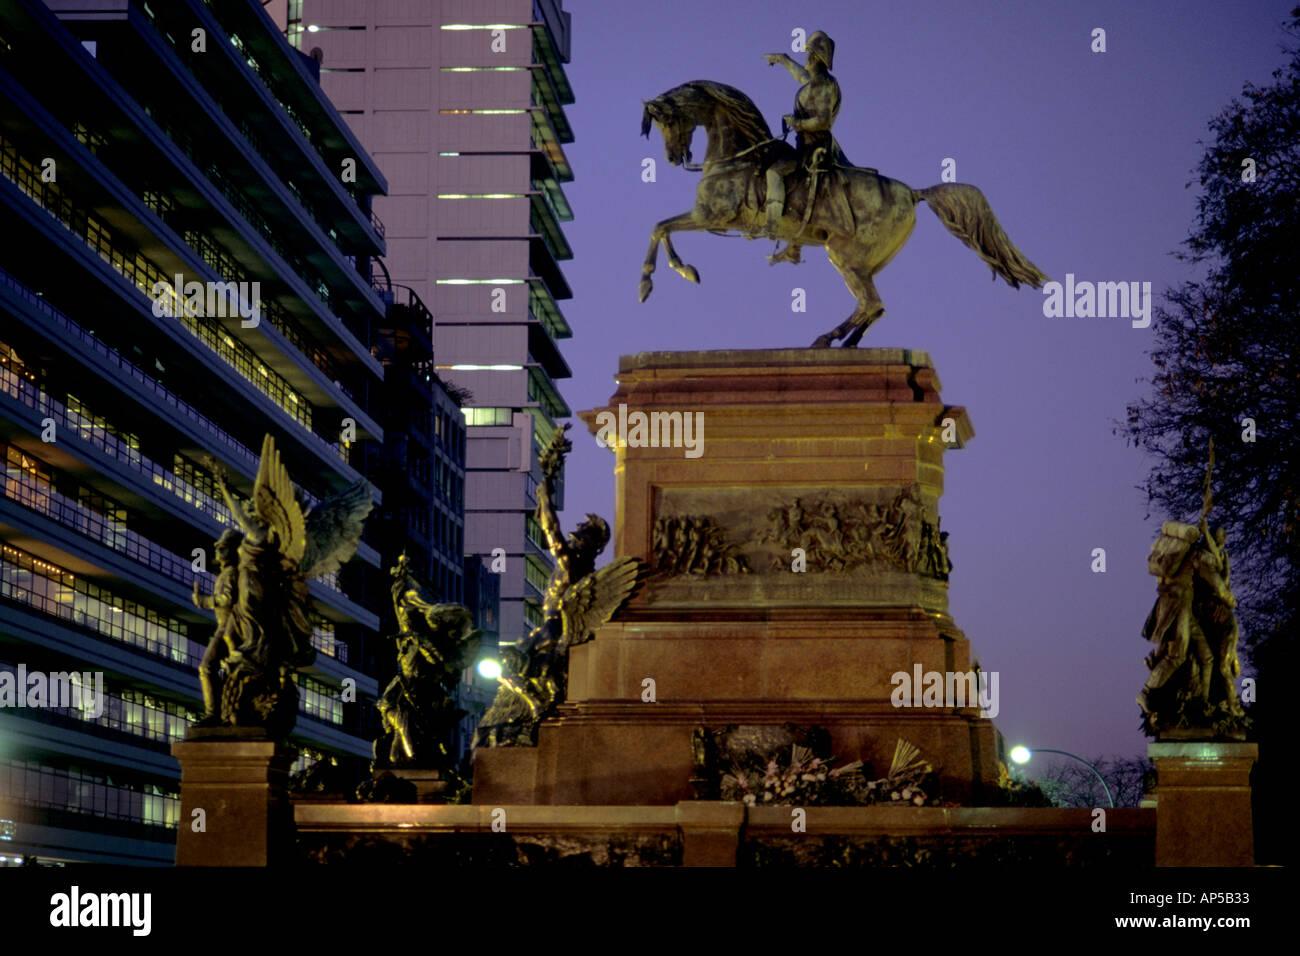 Argentina Buenos Aires Plaza San Martin - Stock Image